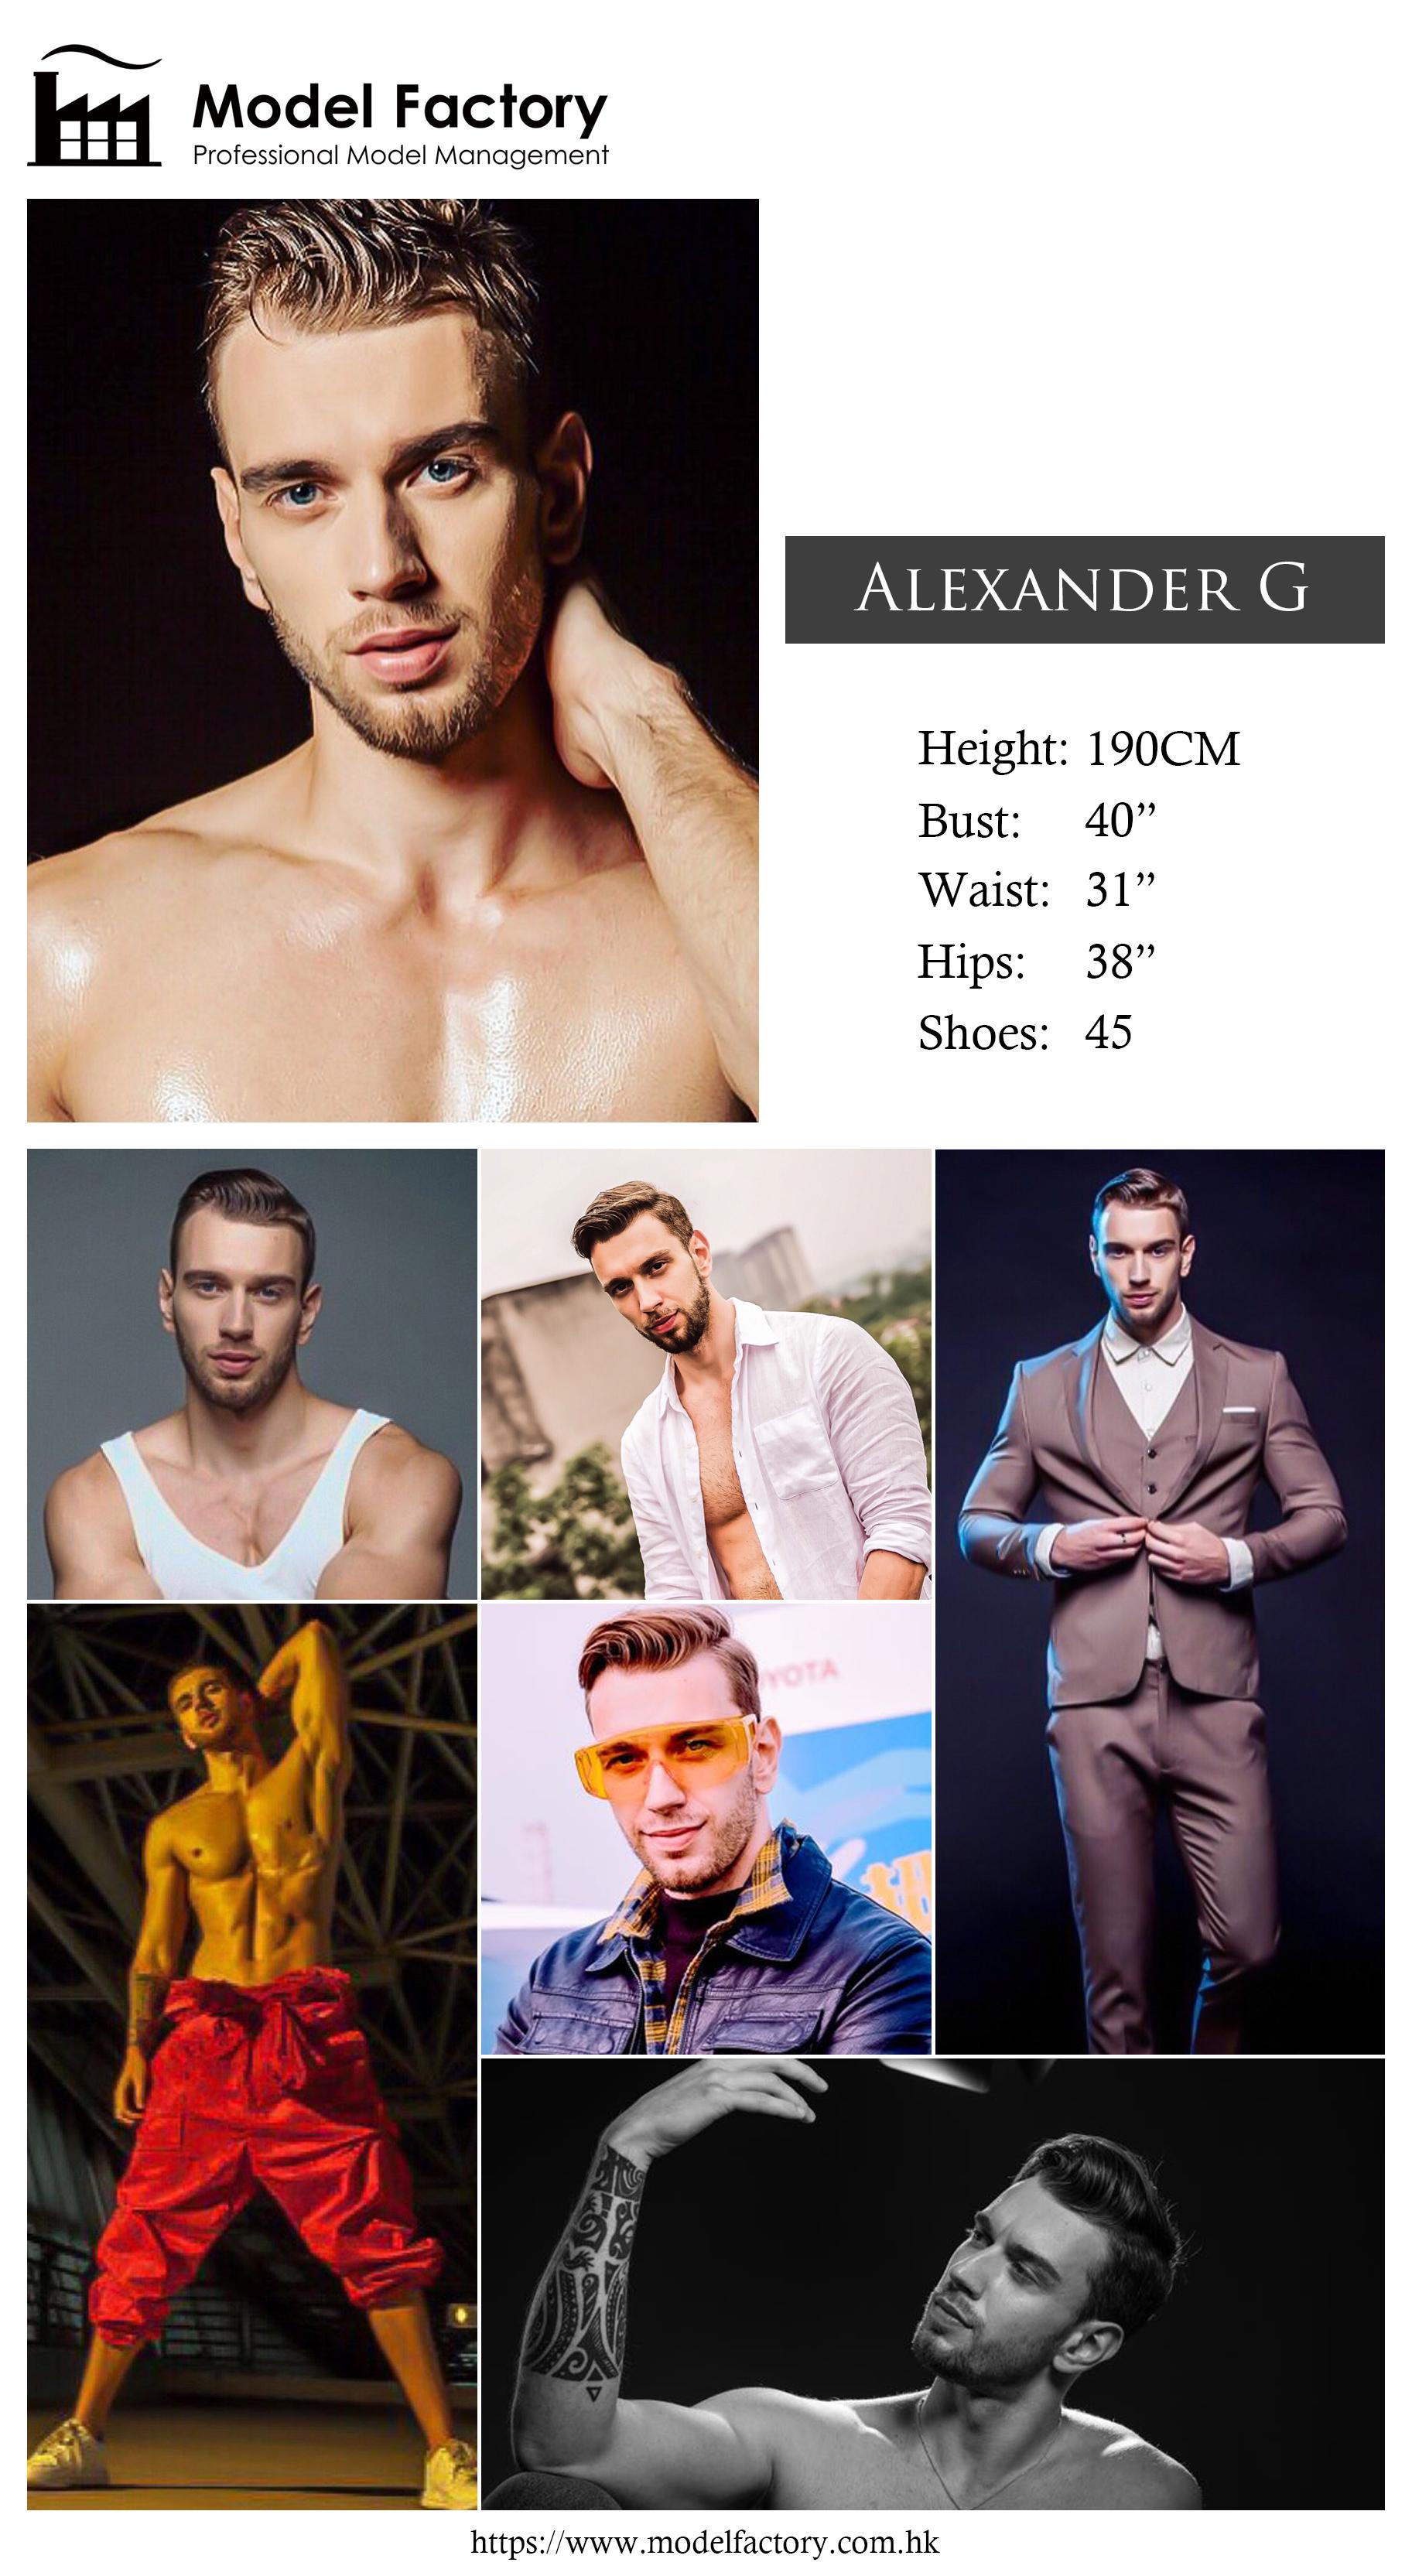 Model Factory Caucasian Male Model AlexanderG